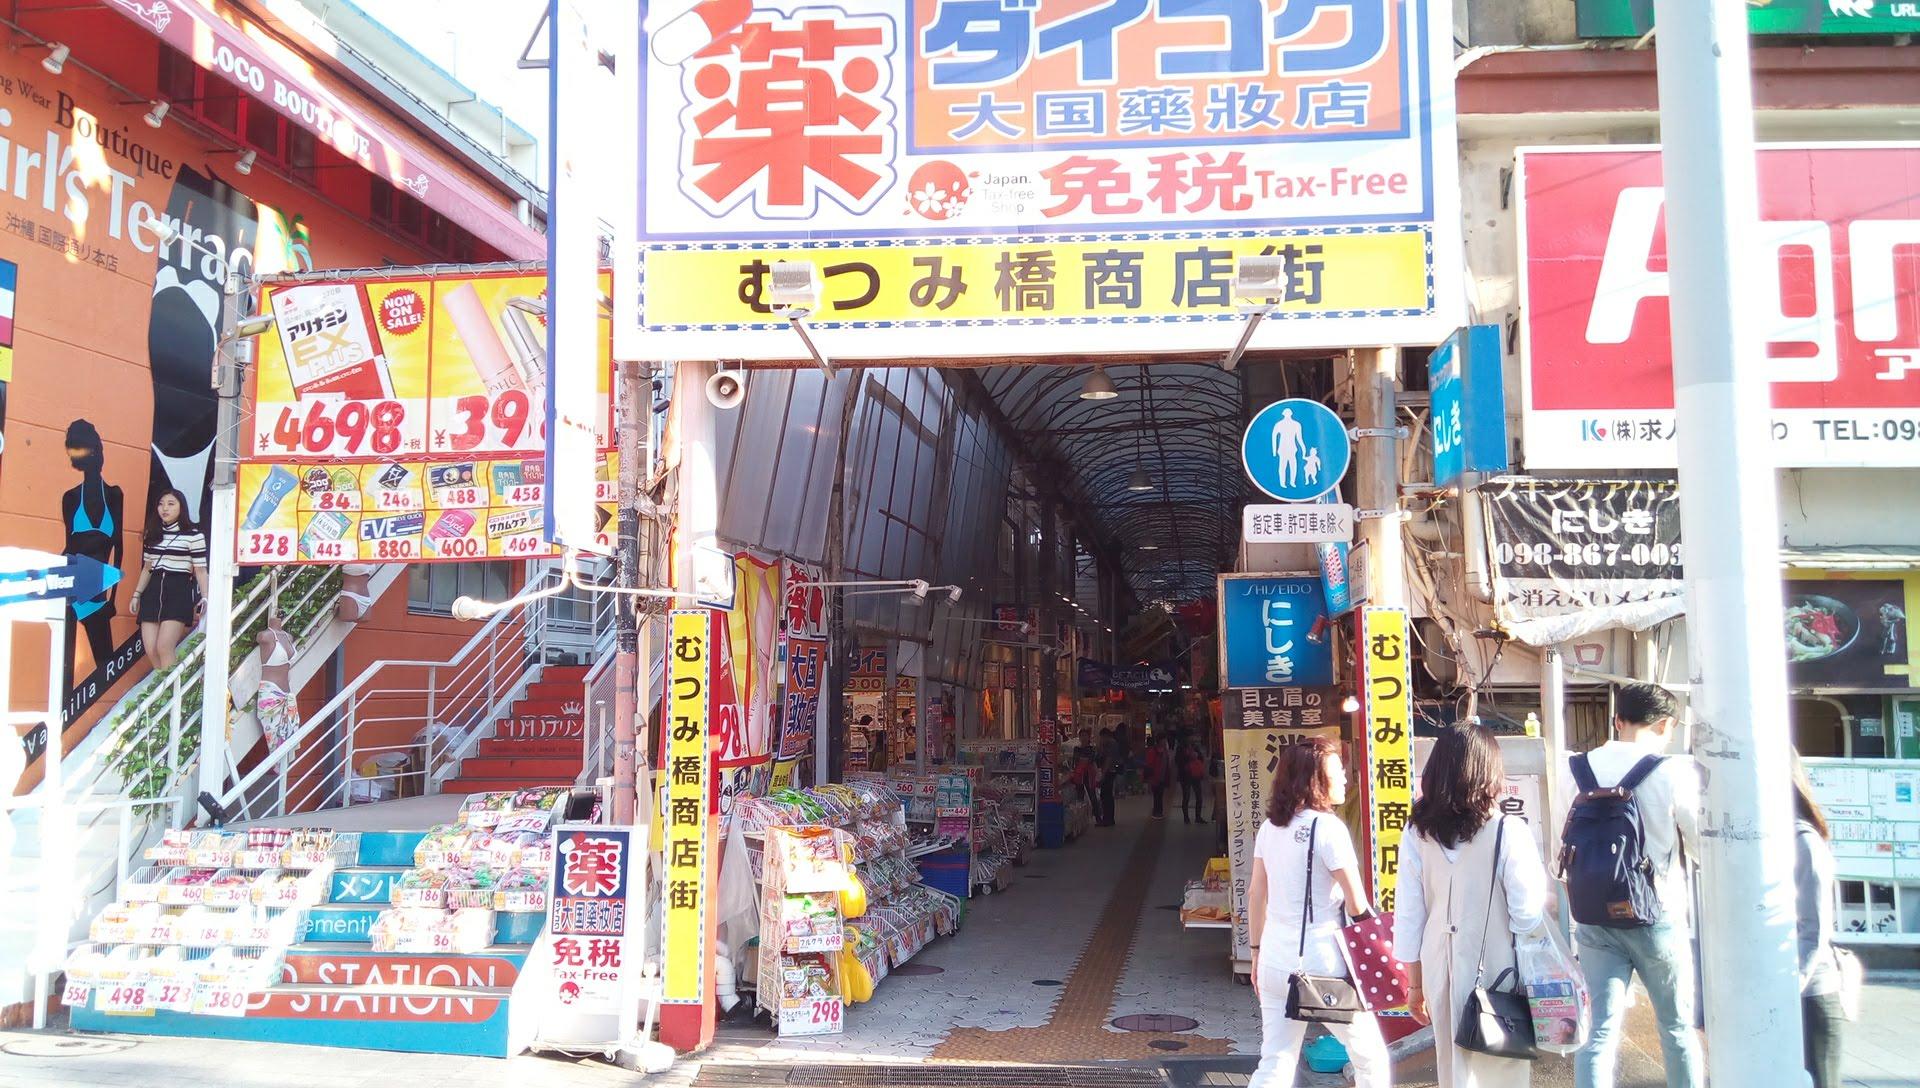 Mutsumi-bashi street